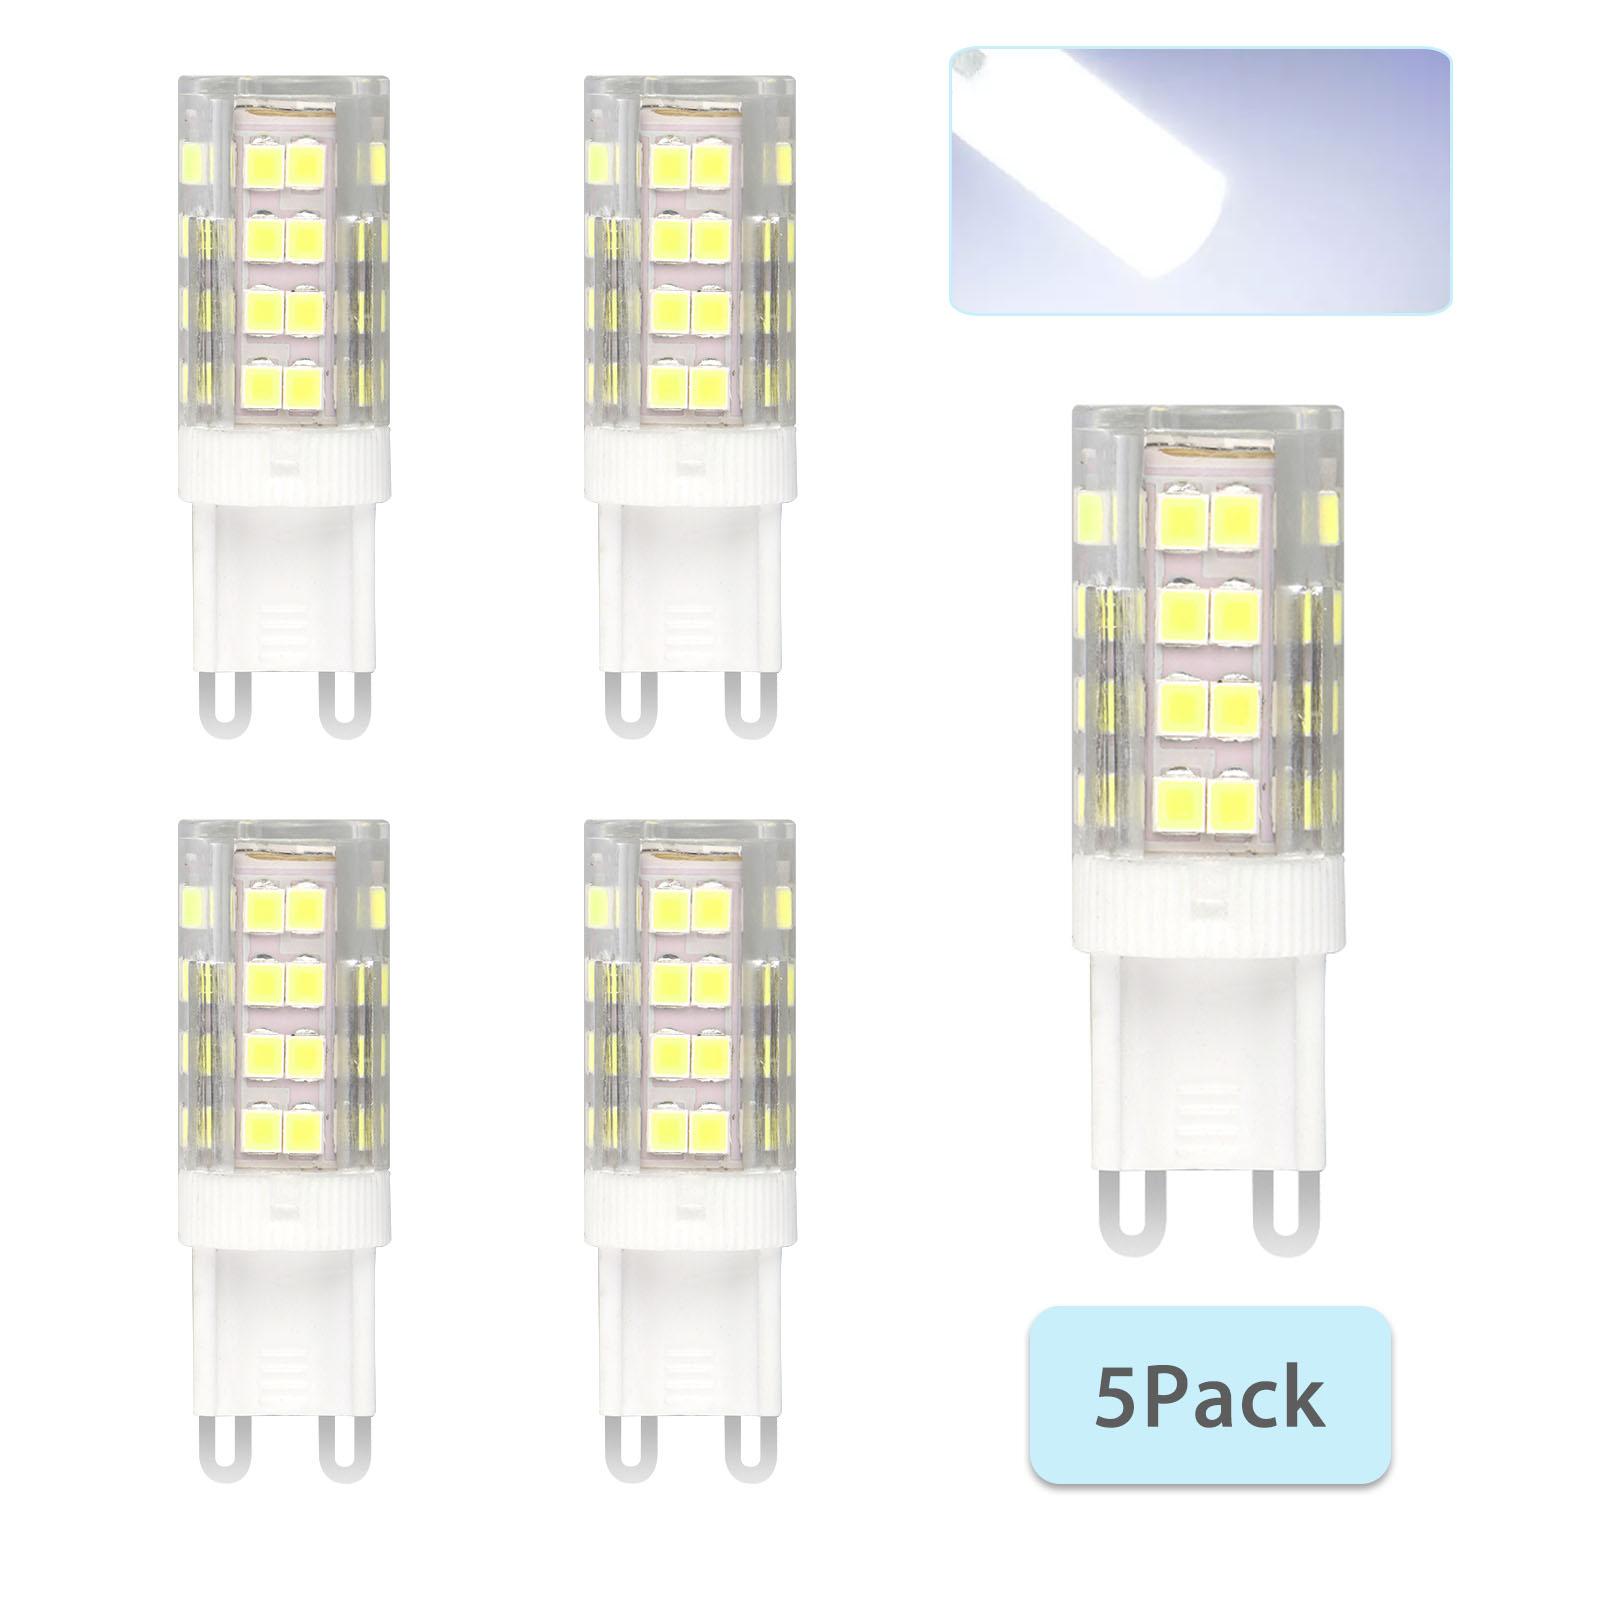 G9-40W-Dimmable-Halogen-LED-Corn-Bulb-Lamp-6000K-2835-40-SMD-Daylight-Home-Light